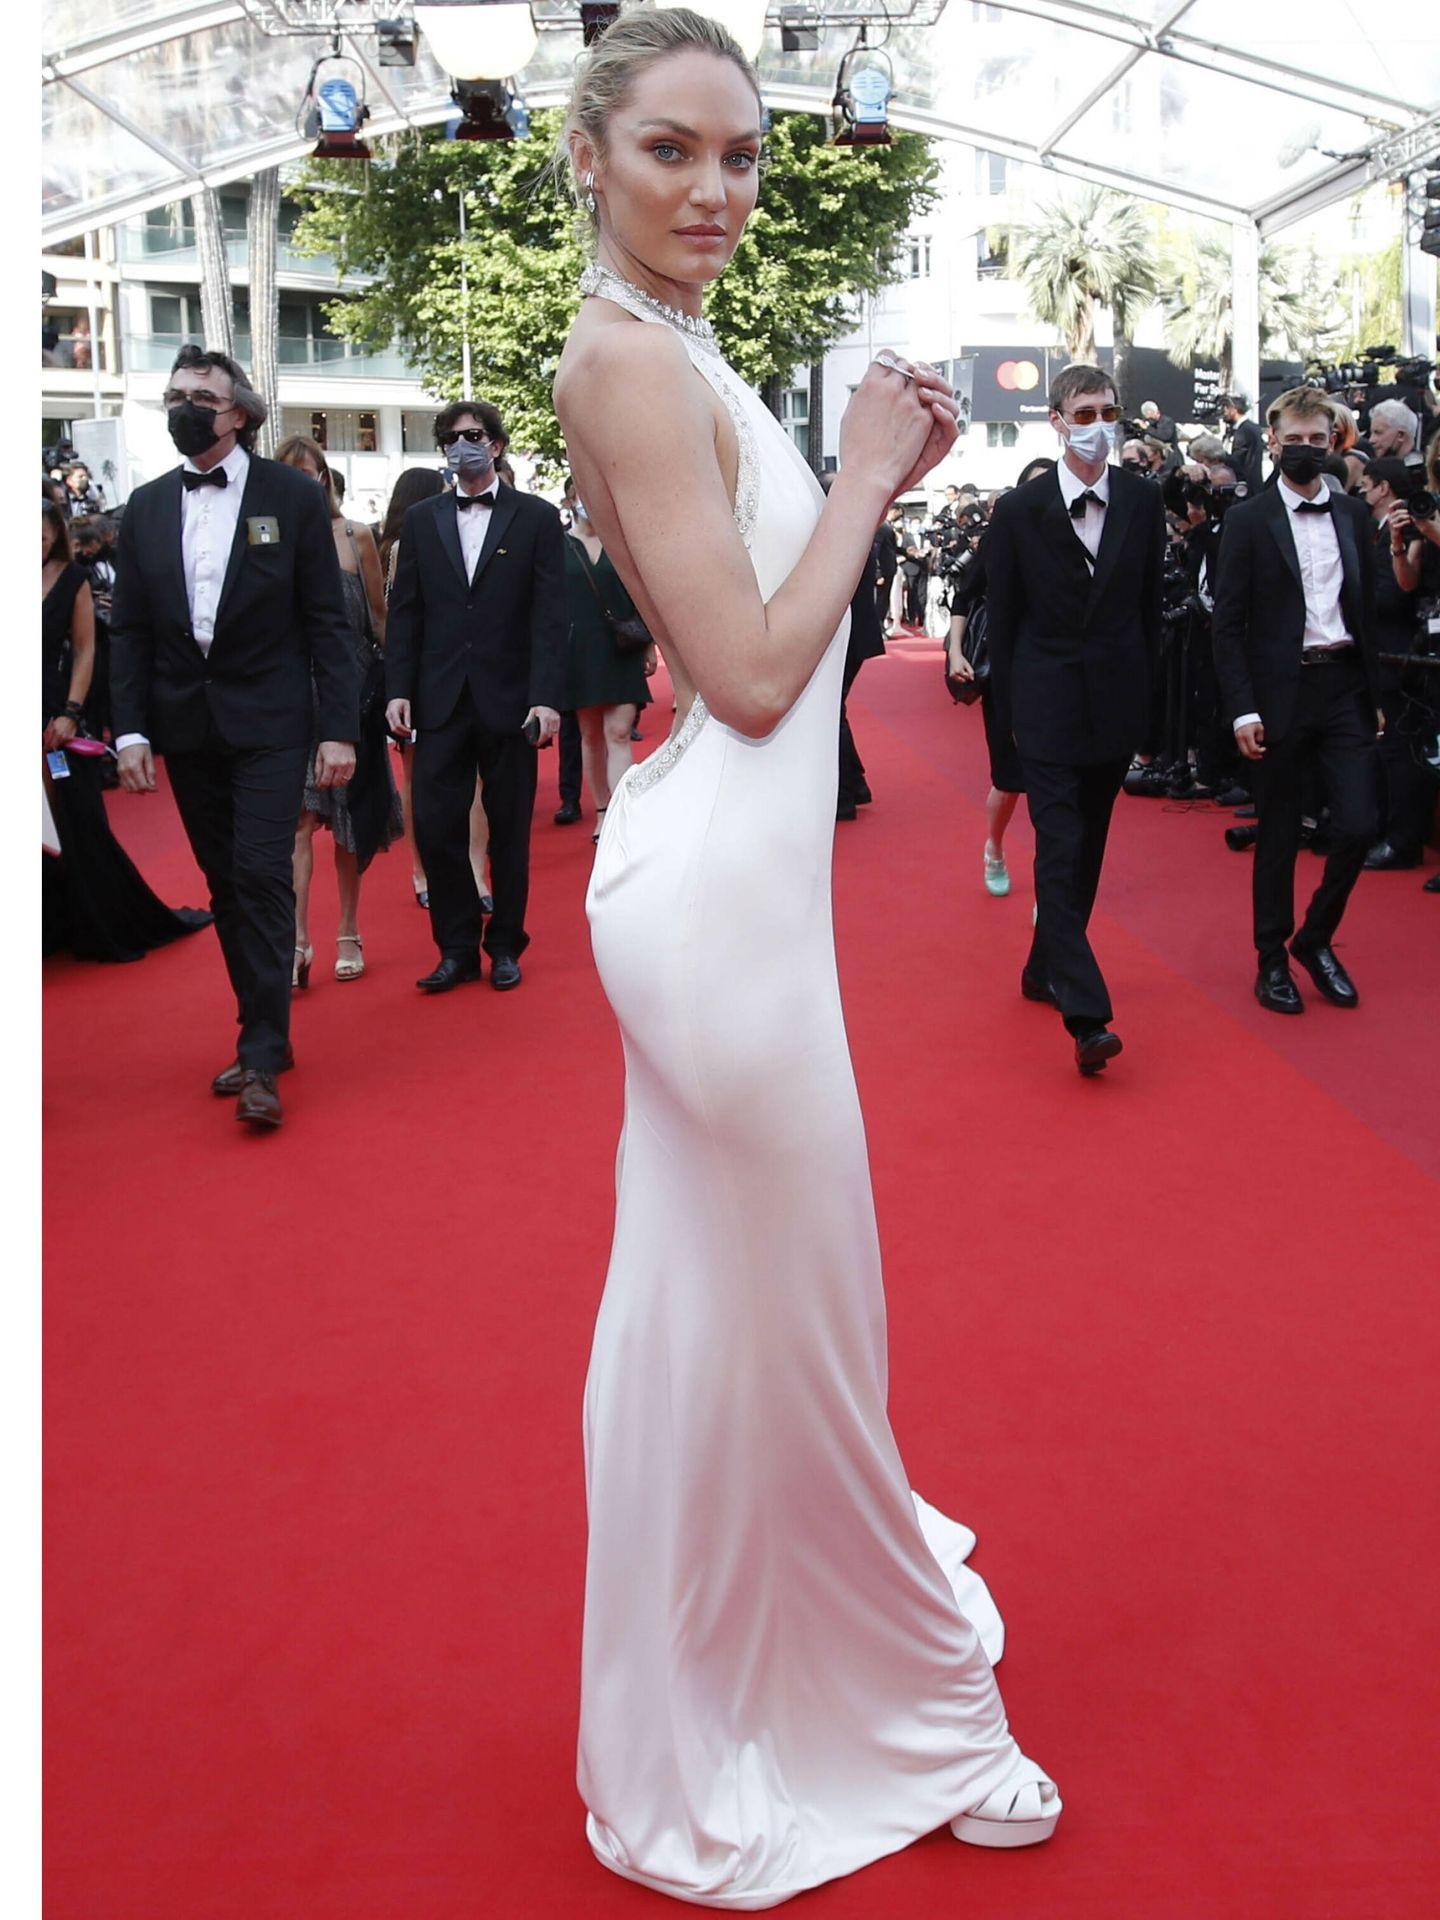 Candice Swanepoel en Cannes. (Reuters)